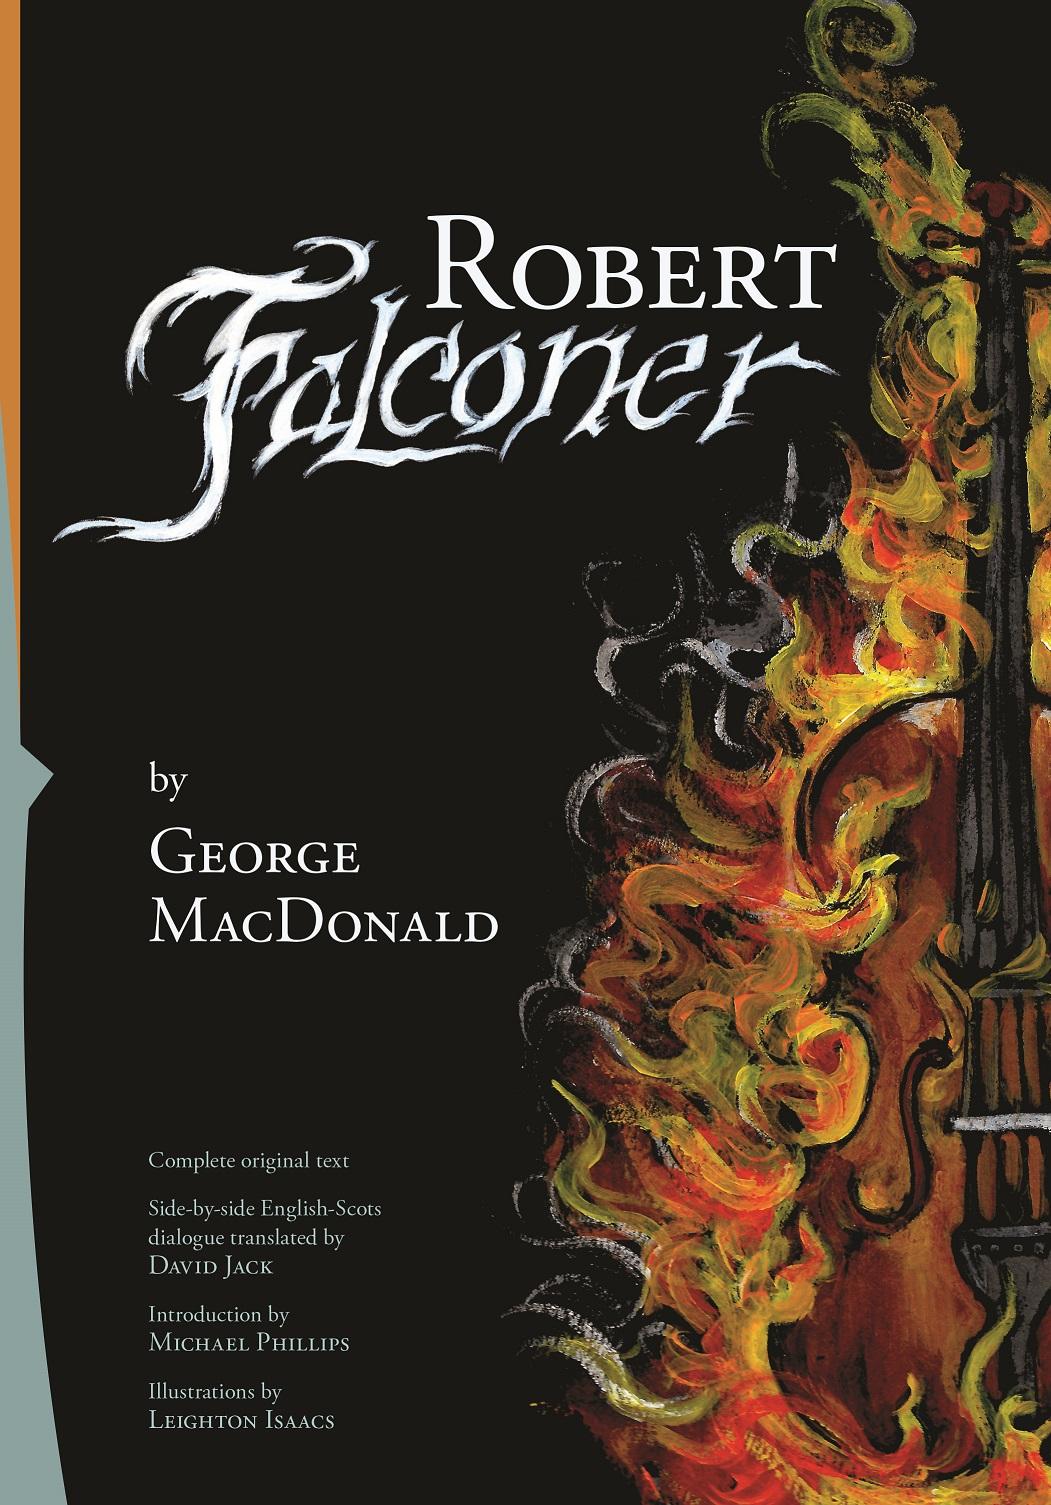 RobertFalconer_CoverFinal_Front Resized.jpg